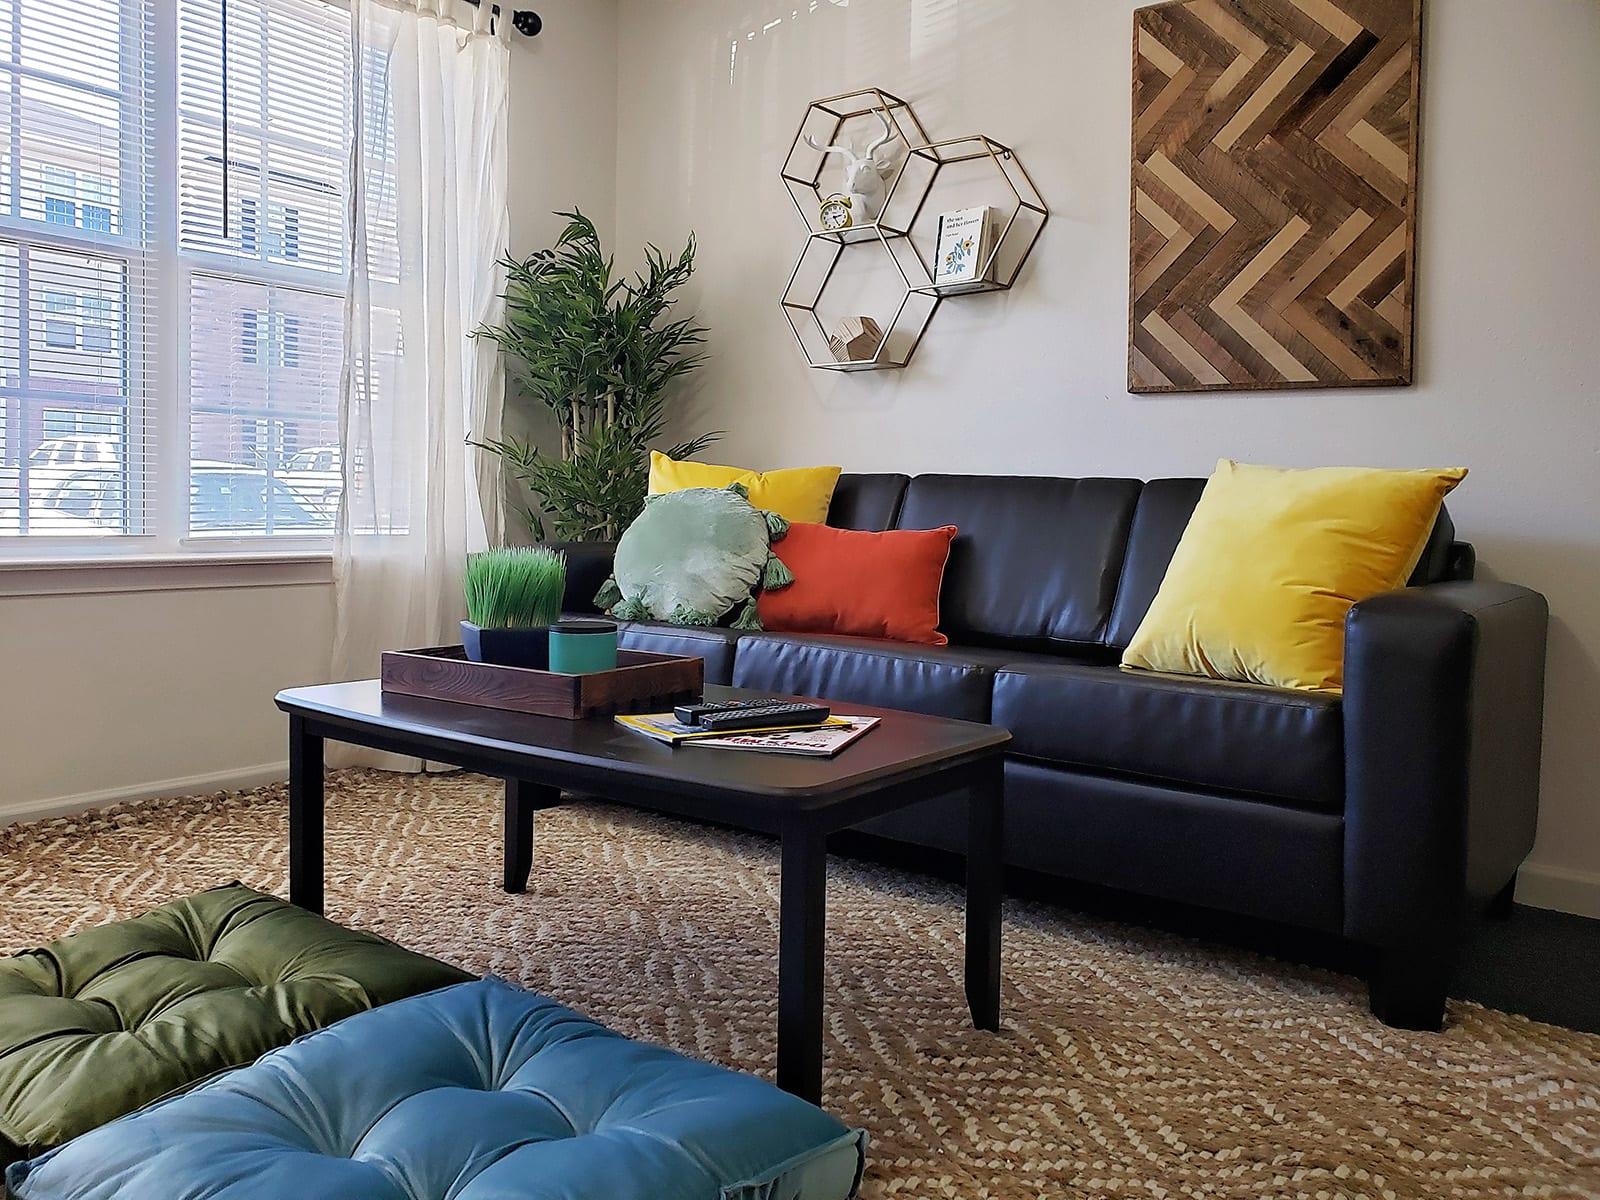 Furnished Student Apartments Laramie WY